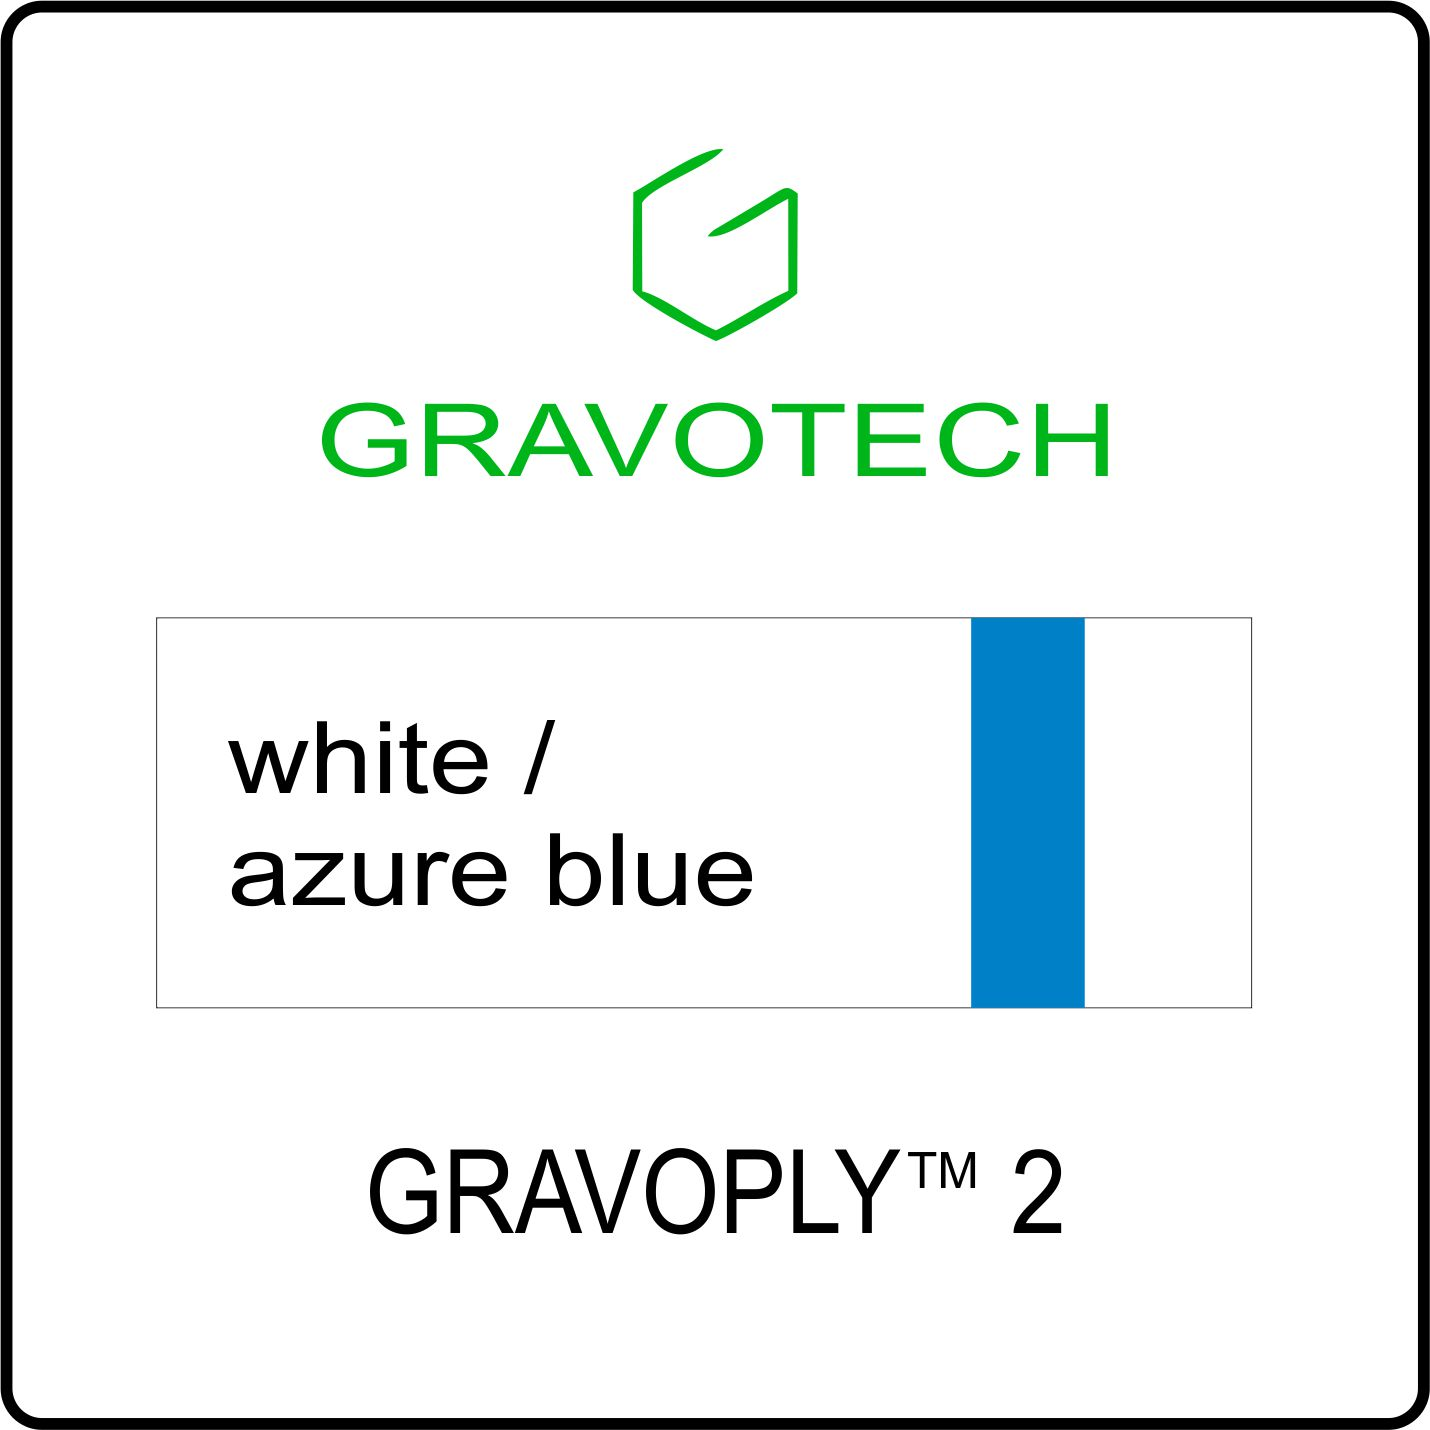 white azure blue